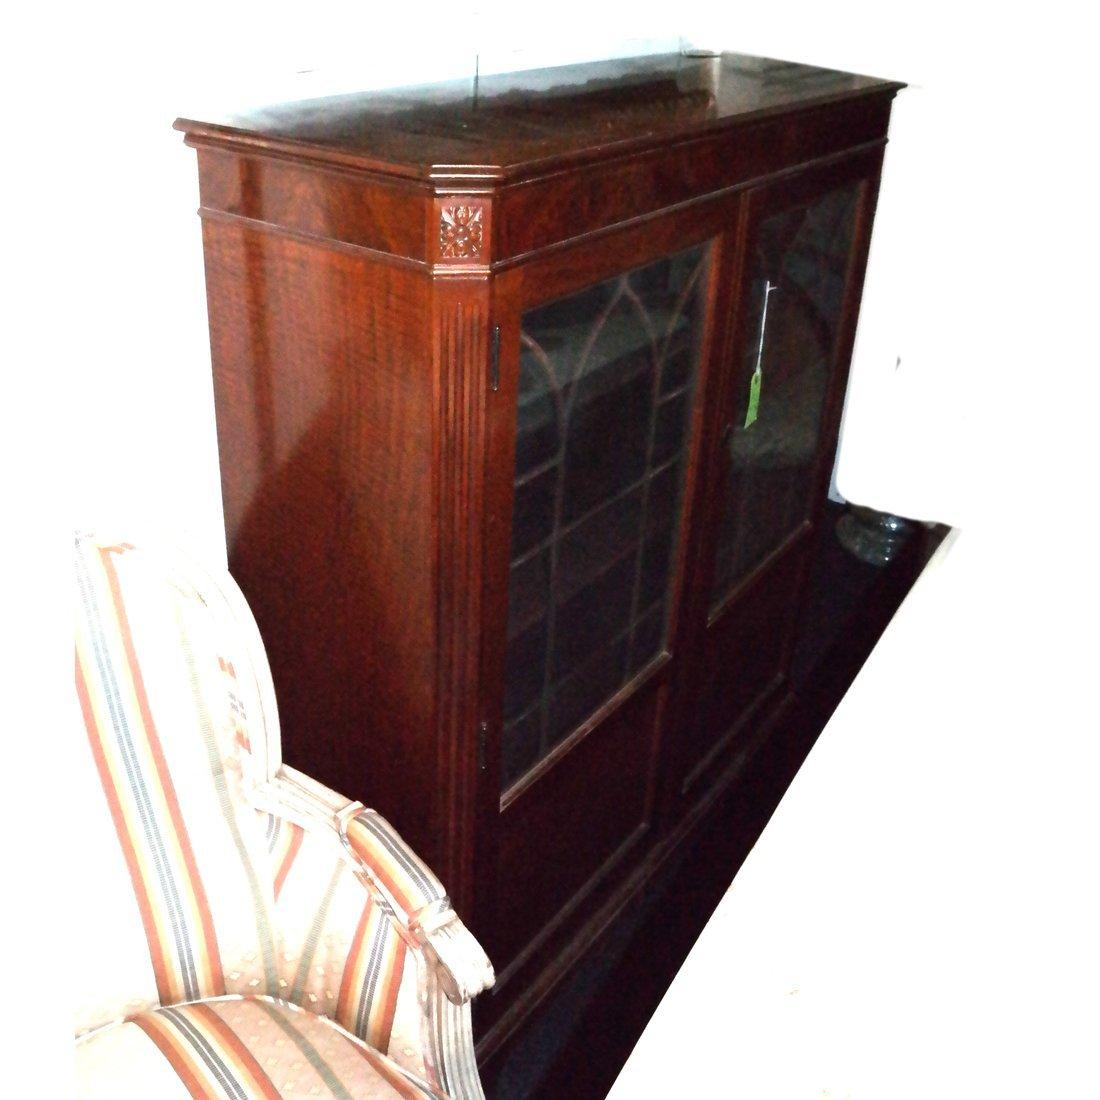 Antique Mahogany Bookcase - 3